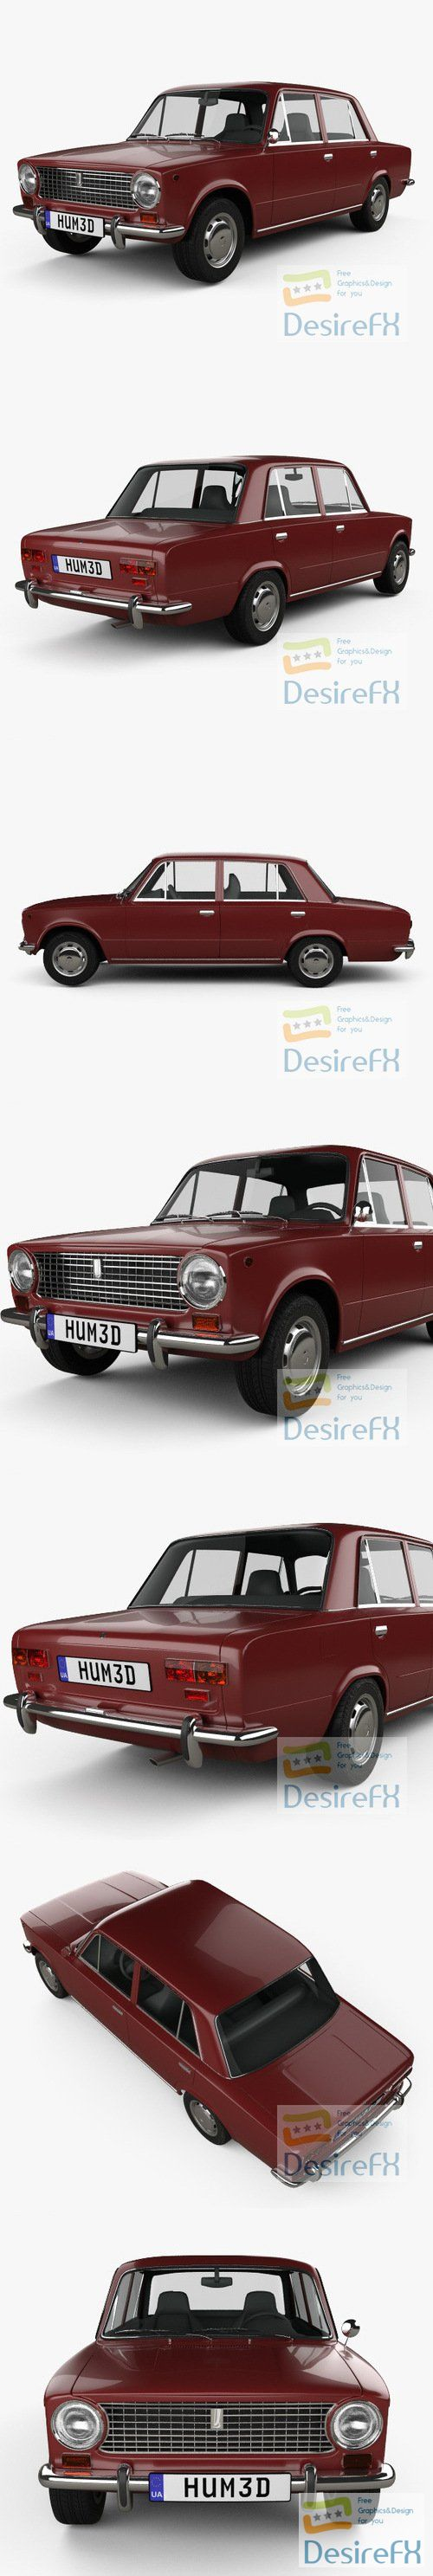 VAZ 2101 Zhiguli 1970 3D Model